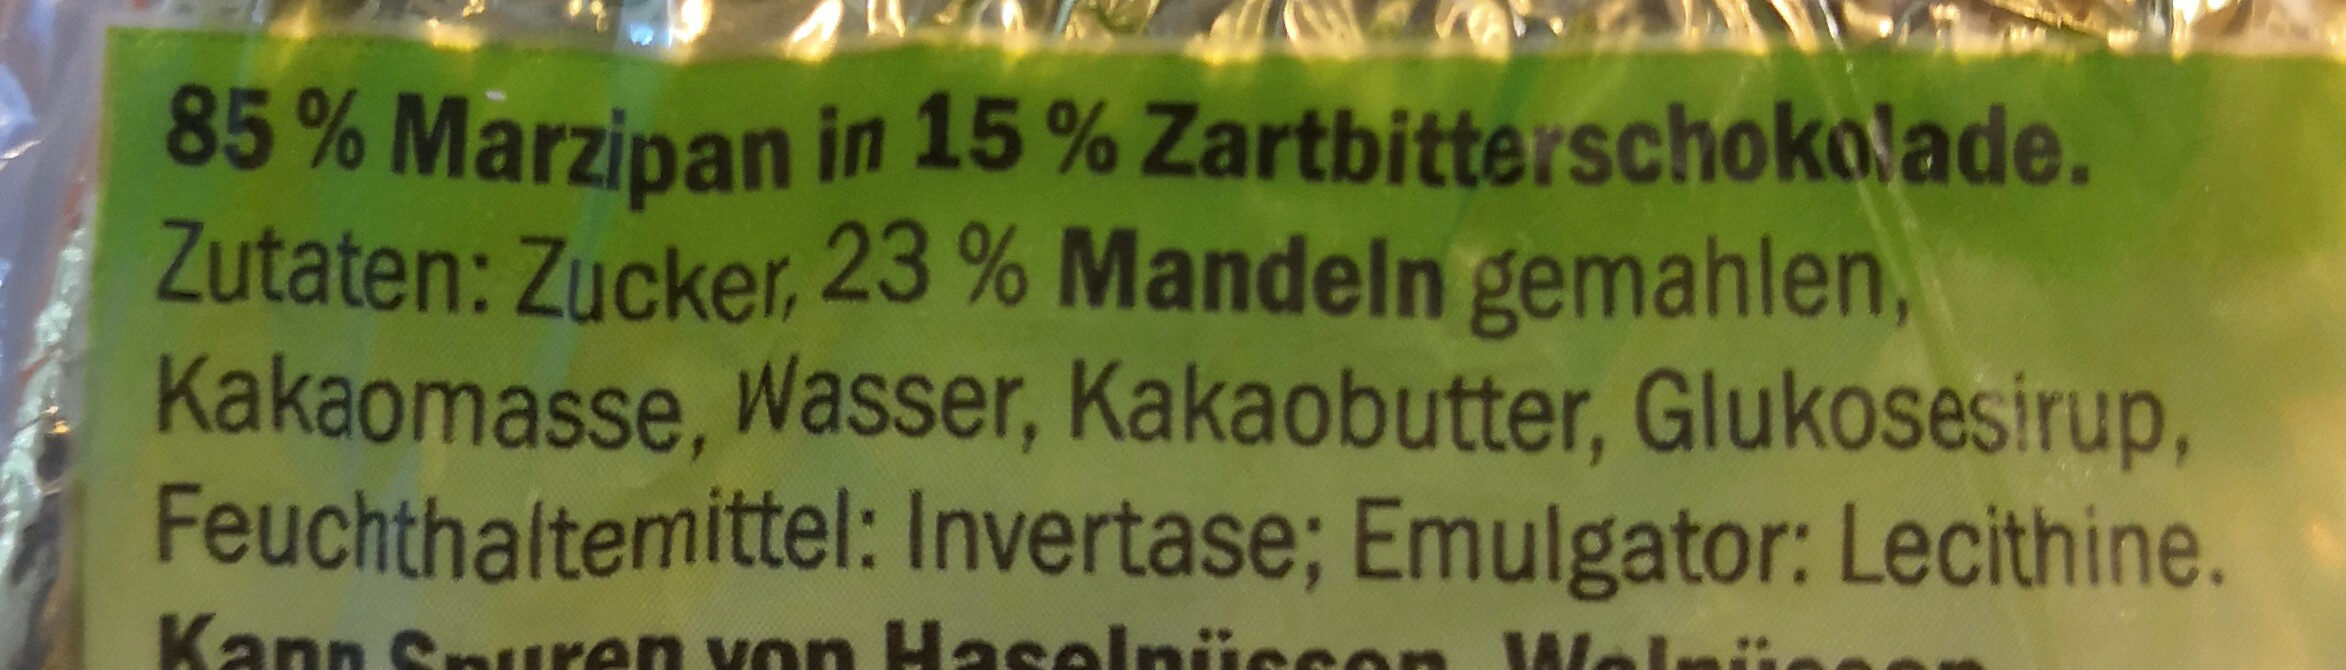 Marzipan-Ei - Ingredients - de